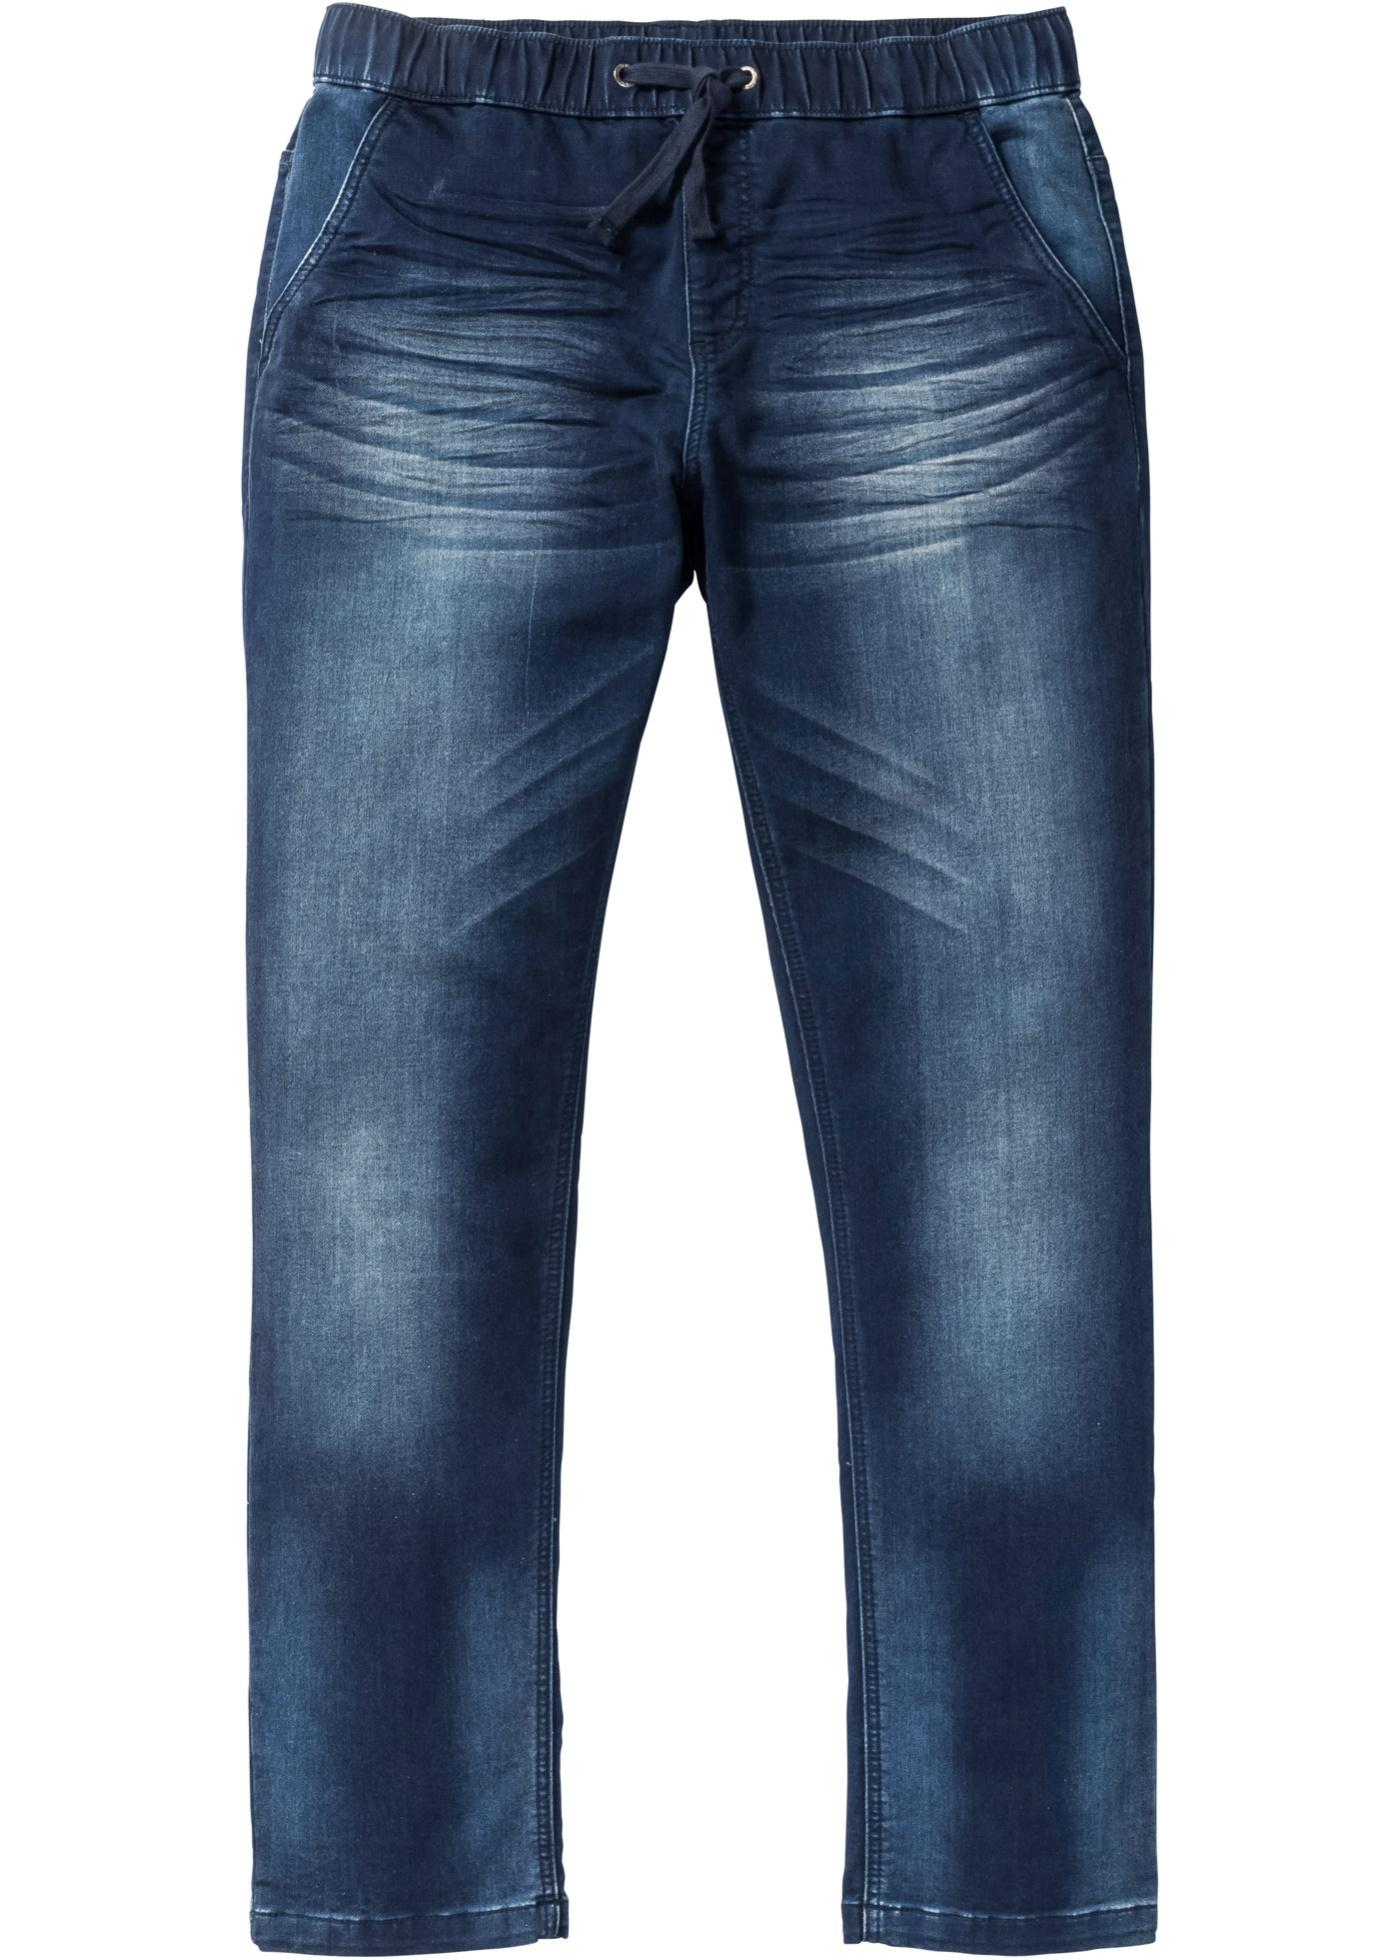 Jeans in felpa regular fi